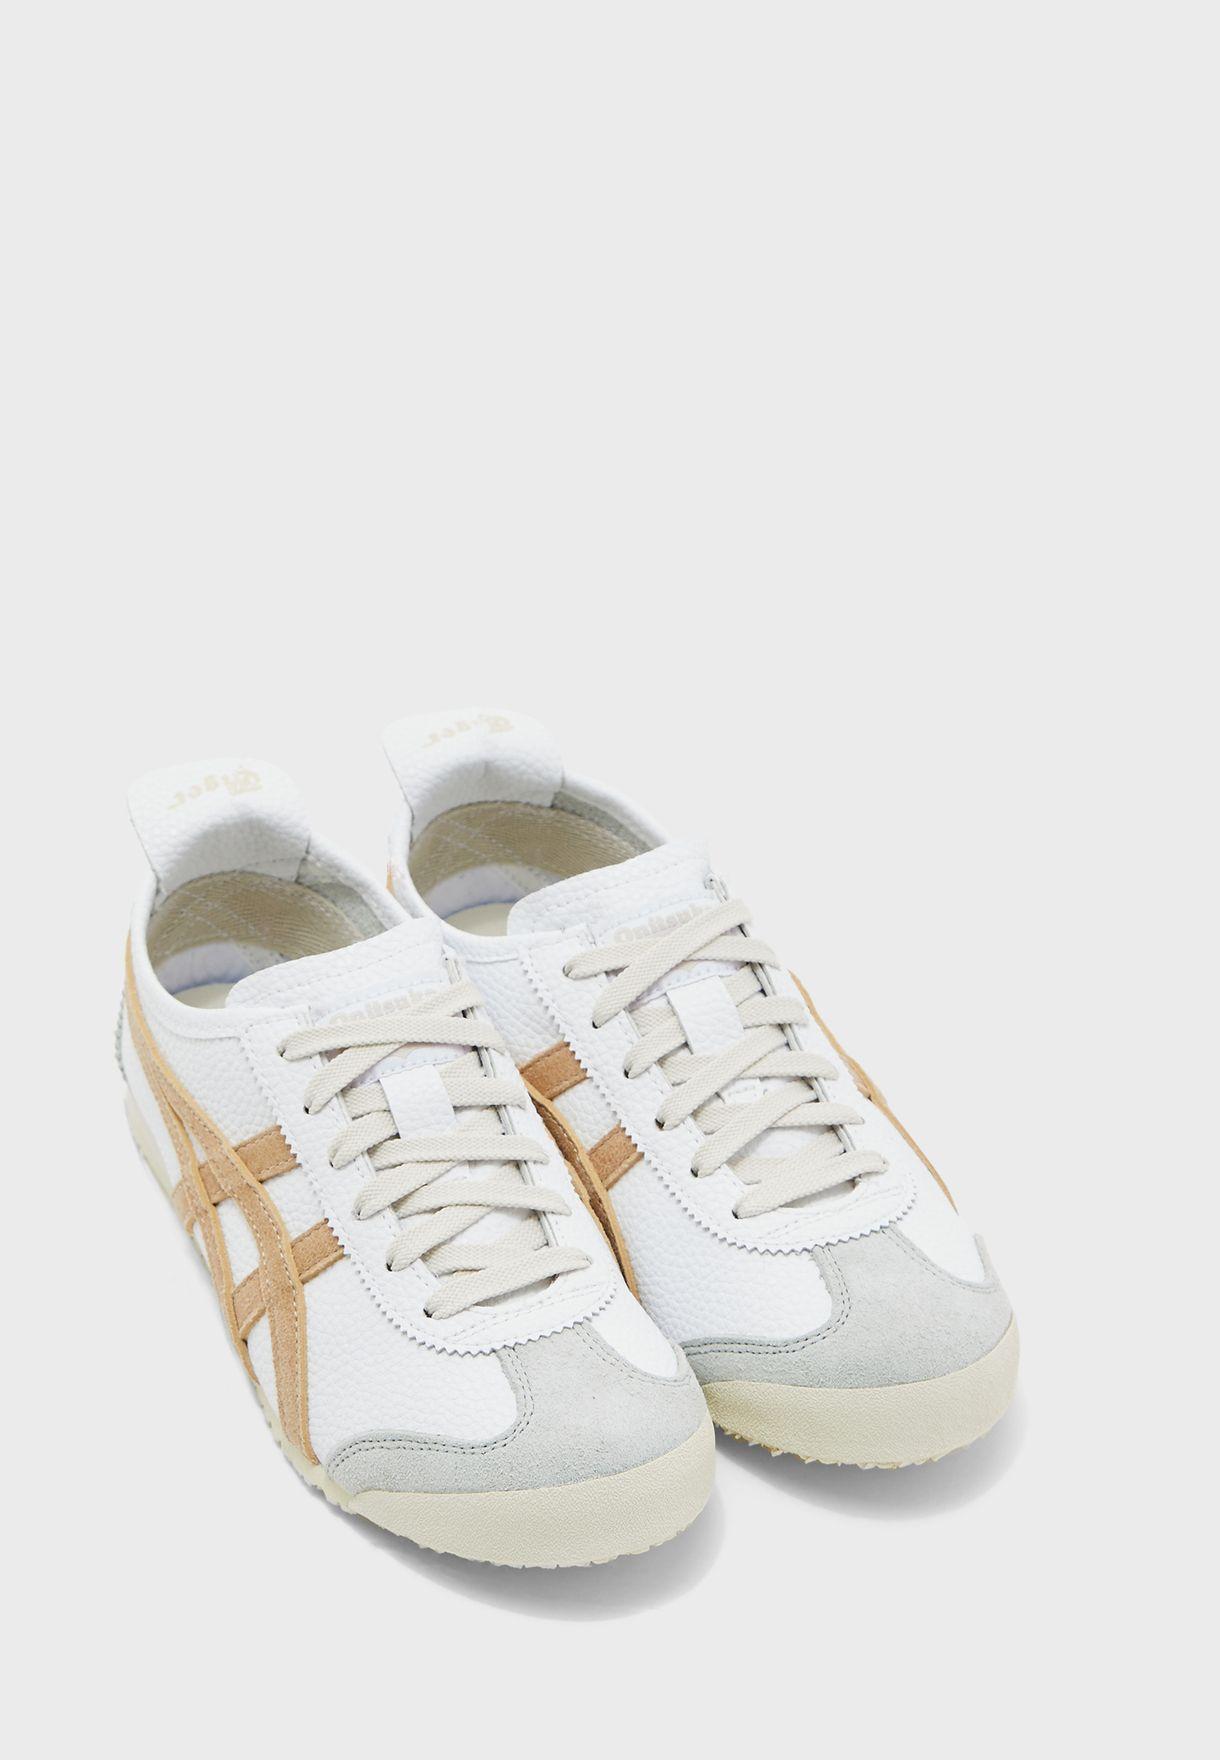 onitsuka tiger mexico 66 shop online 800